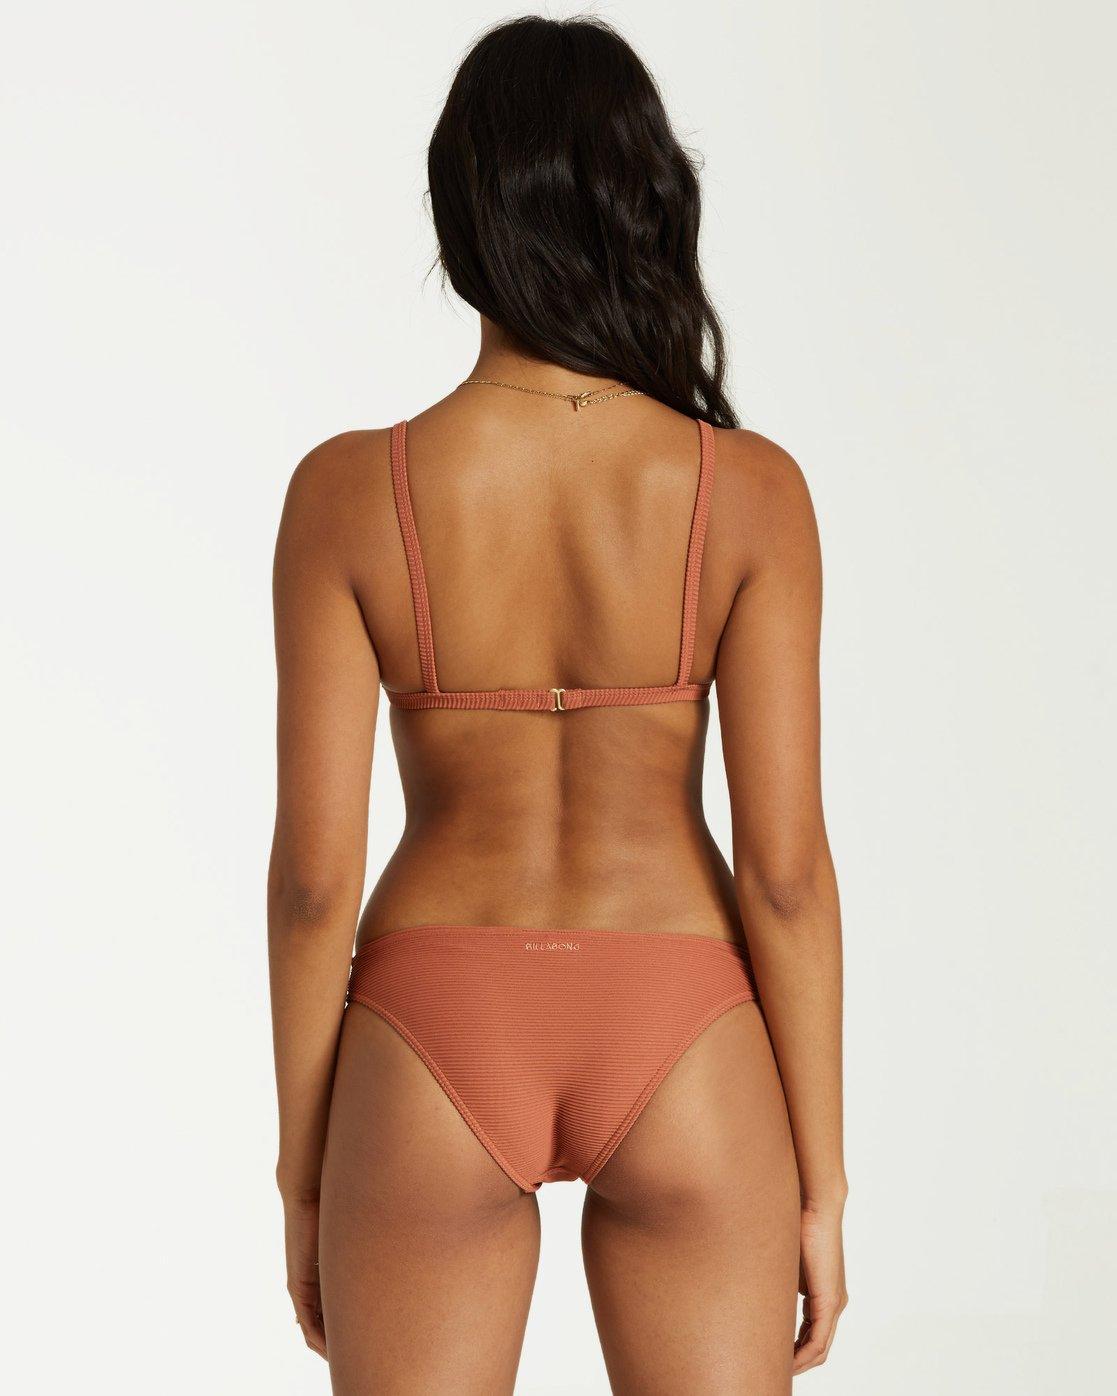 Tanlines Fixed Tri Bikini Top